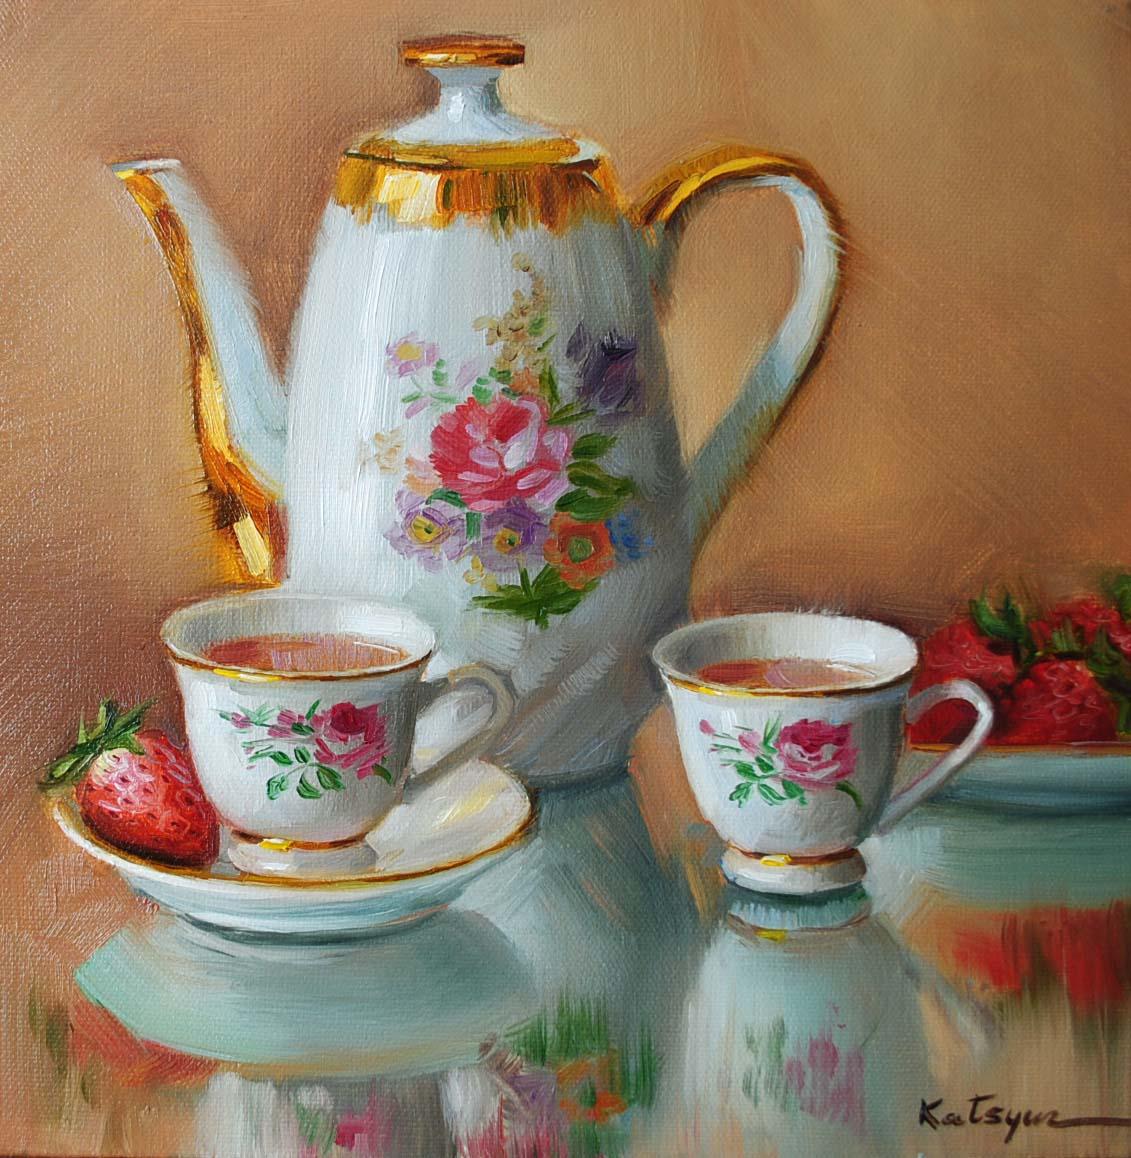 """Hot Chocolate"" original fine art by Elena Katsyura"